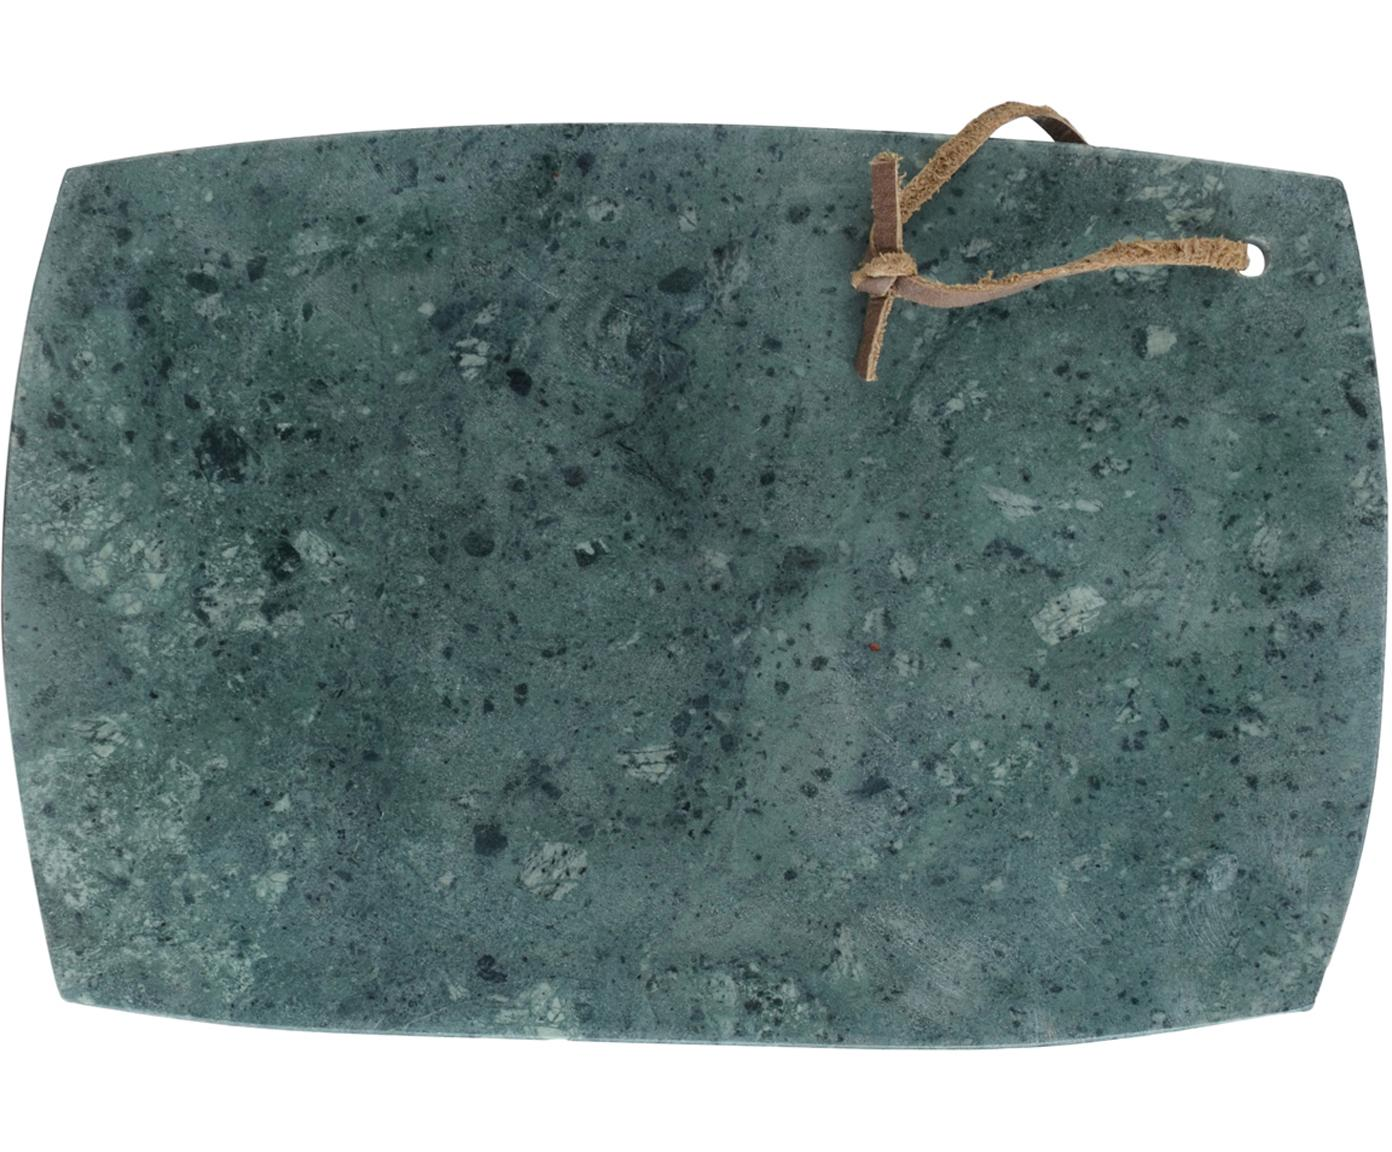 Tagliere in marmo Chopchop, Marmo, Verde, Larg. 20 x Lung. 30 cm